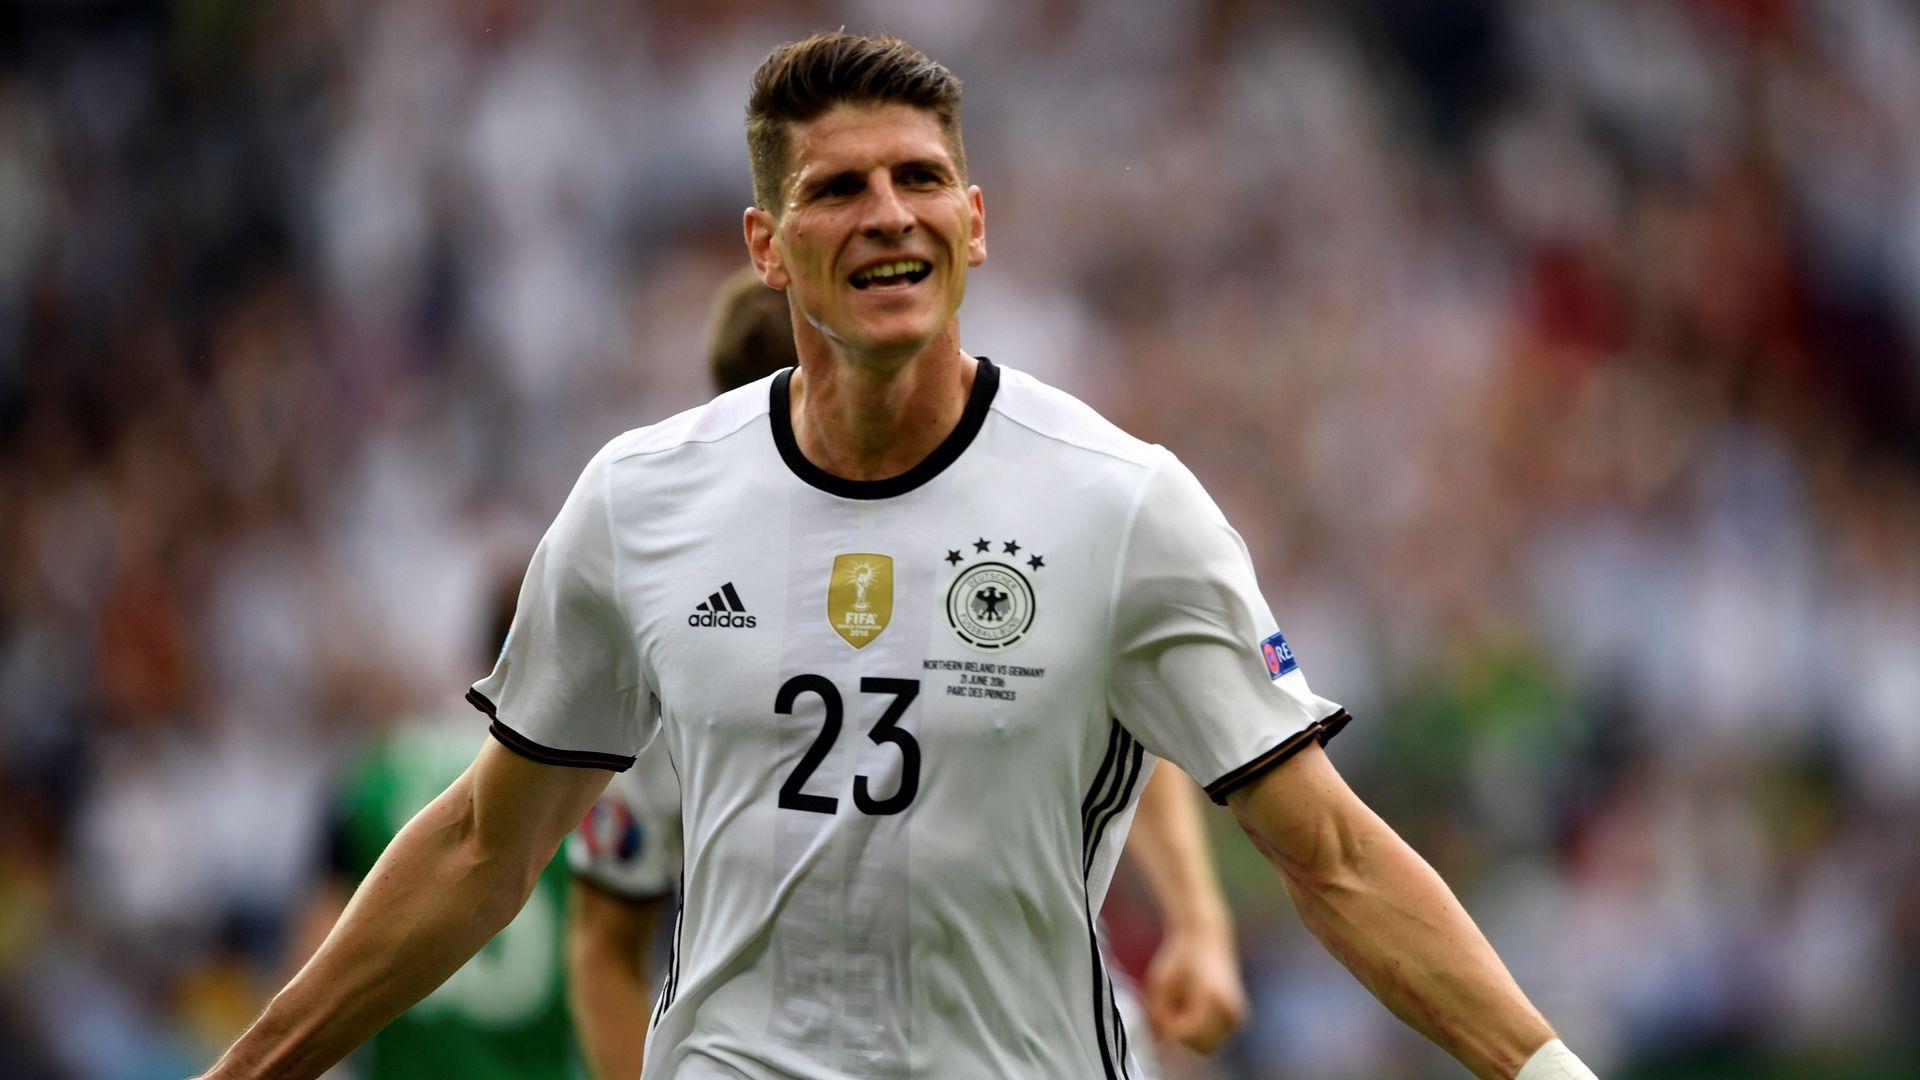 Mario Gomez International Retirement Stuttgart Striker Joins Mesut Ozil In Ruling Himself Out Of Future Consideration For Germany Goal Com